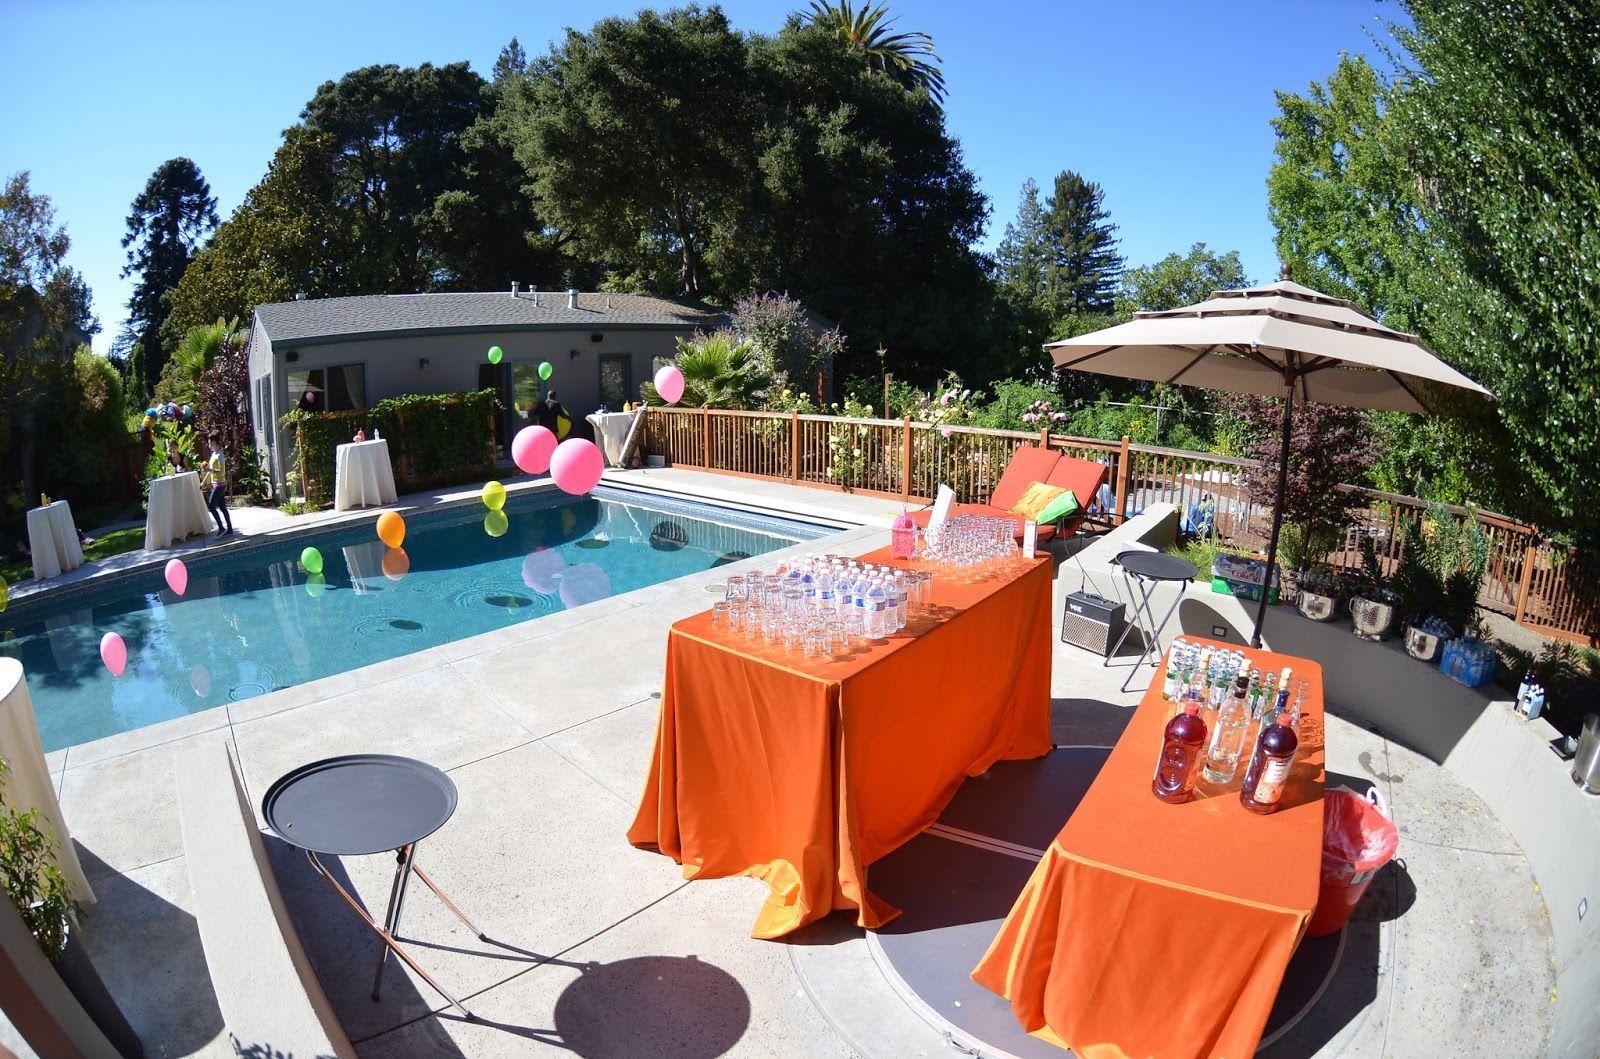 elegant+fiesta+pool+bar.JPG (1600×1059)